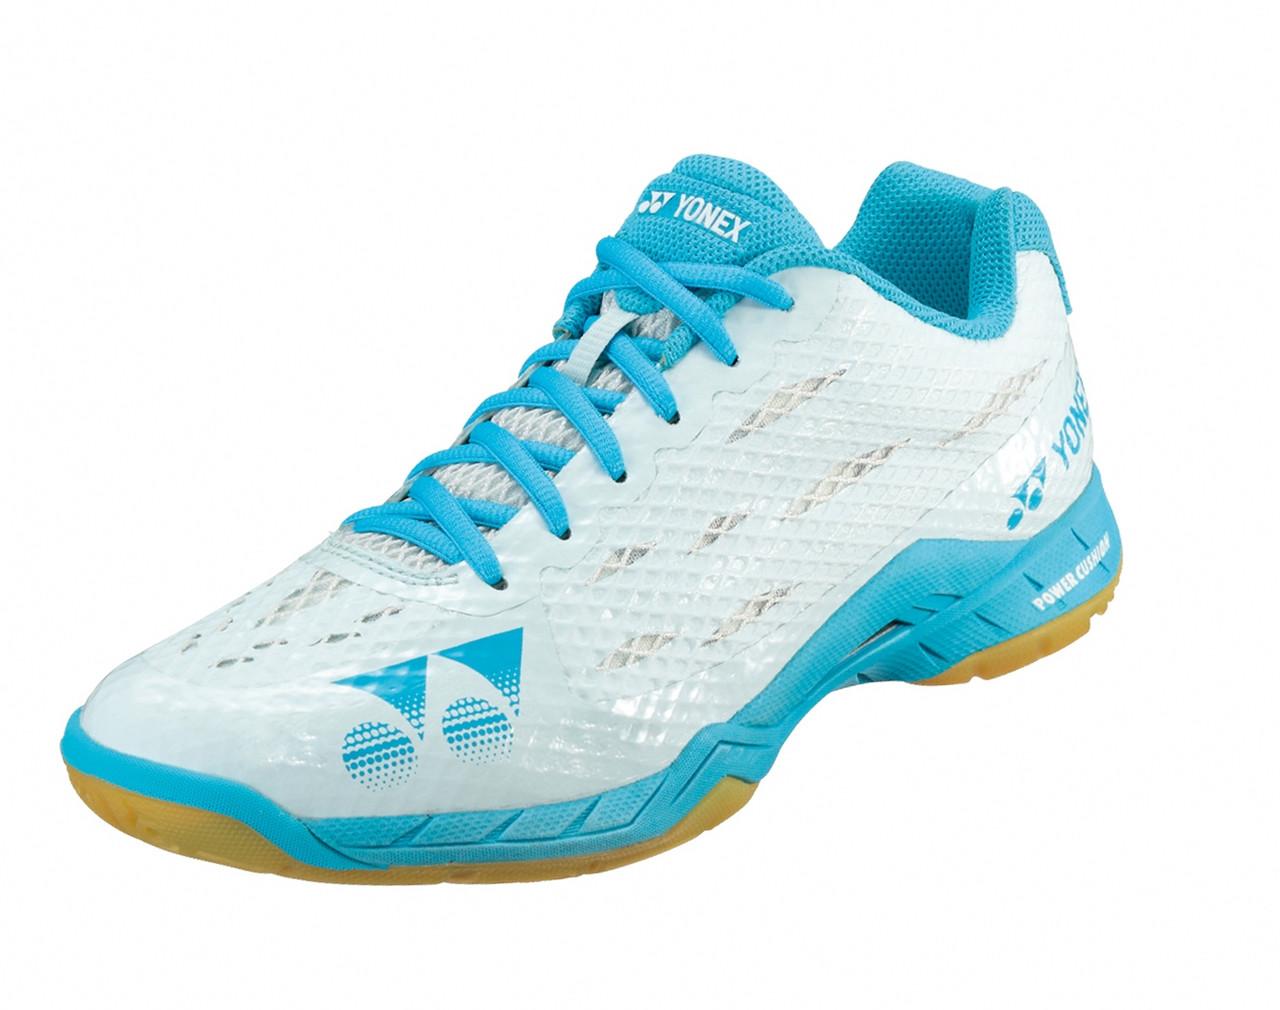 Кроссовки для бадминтона Yonex SHB-Aerus Ladies Pale Blue